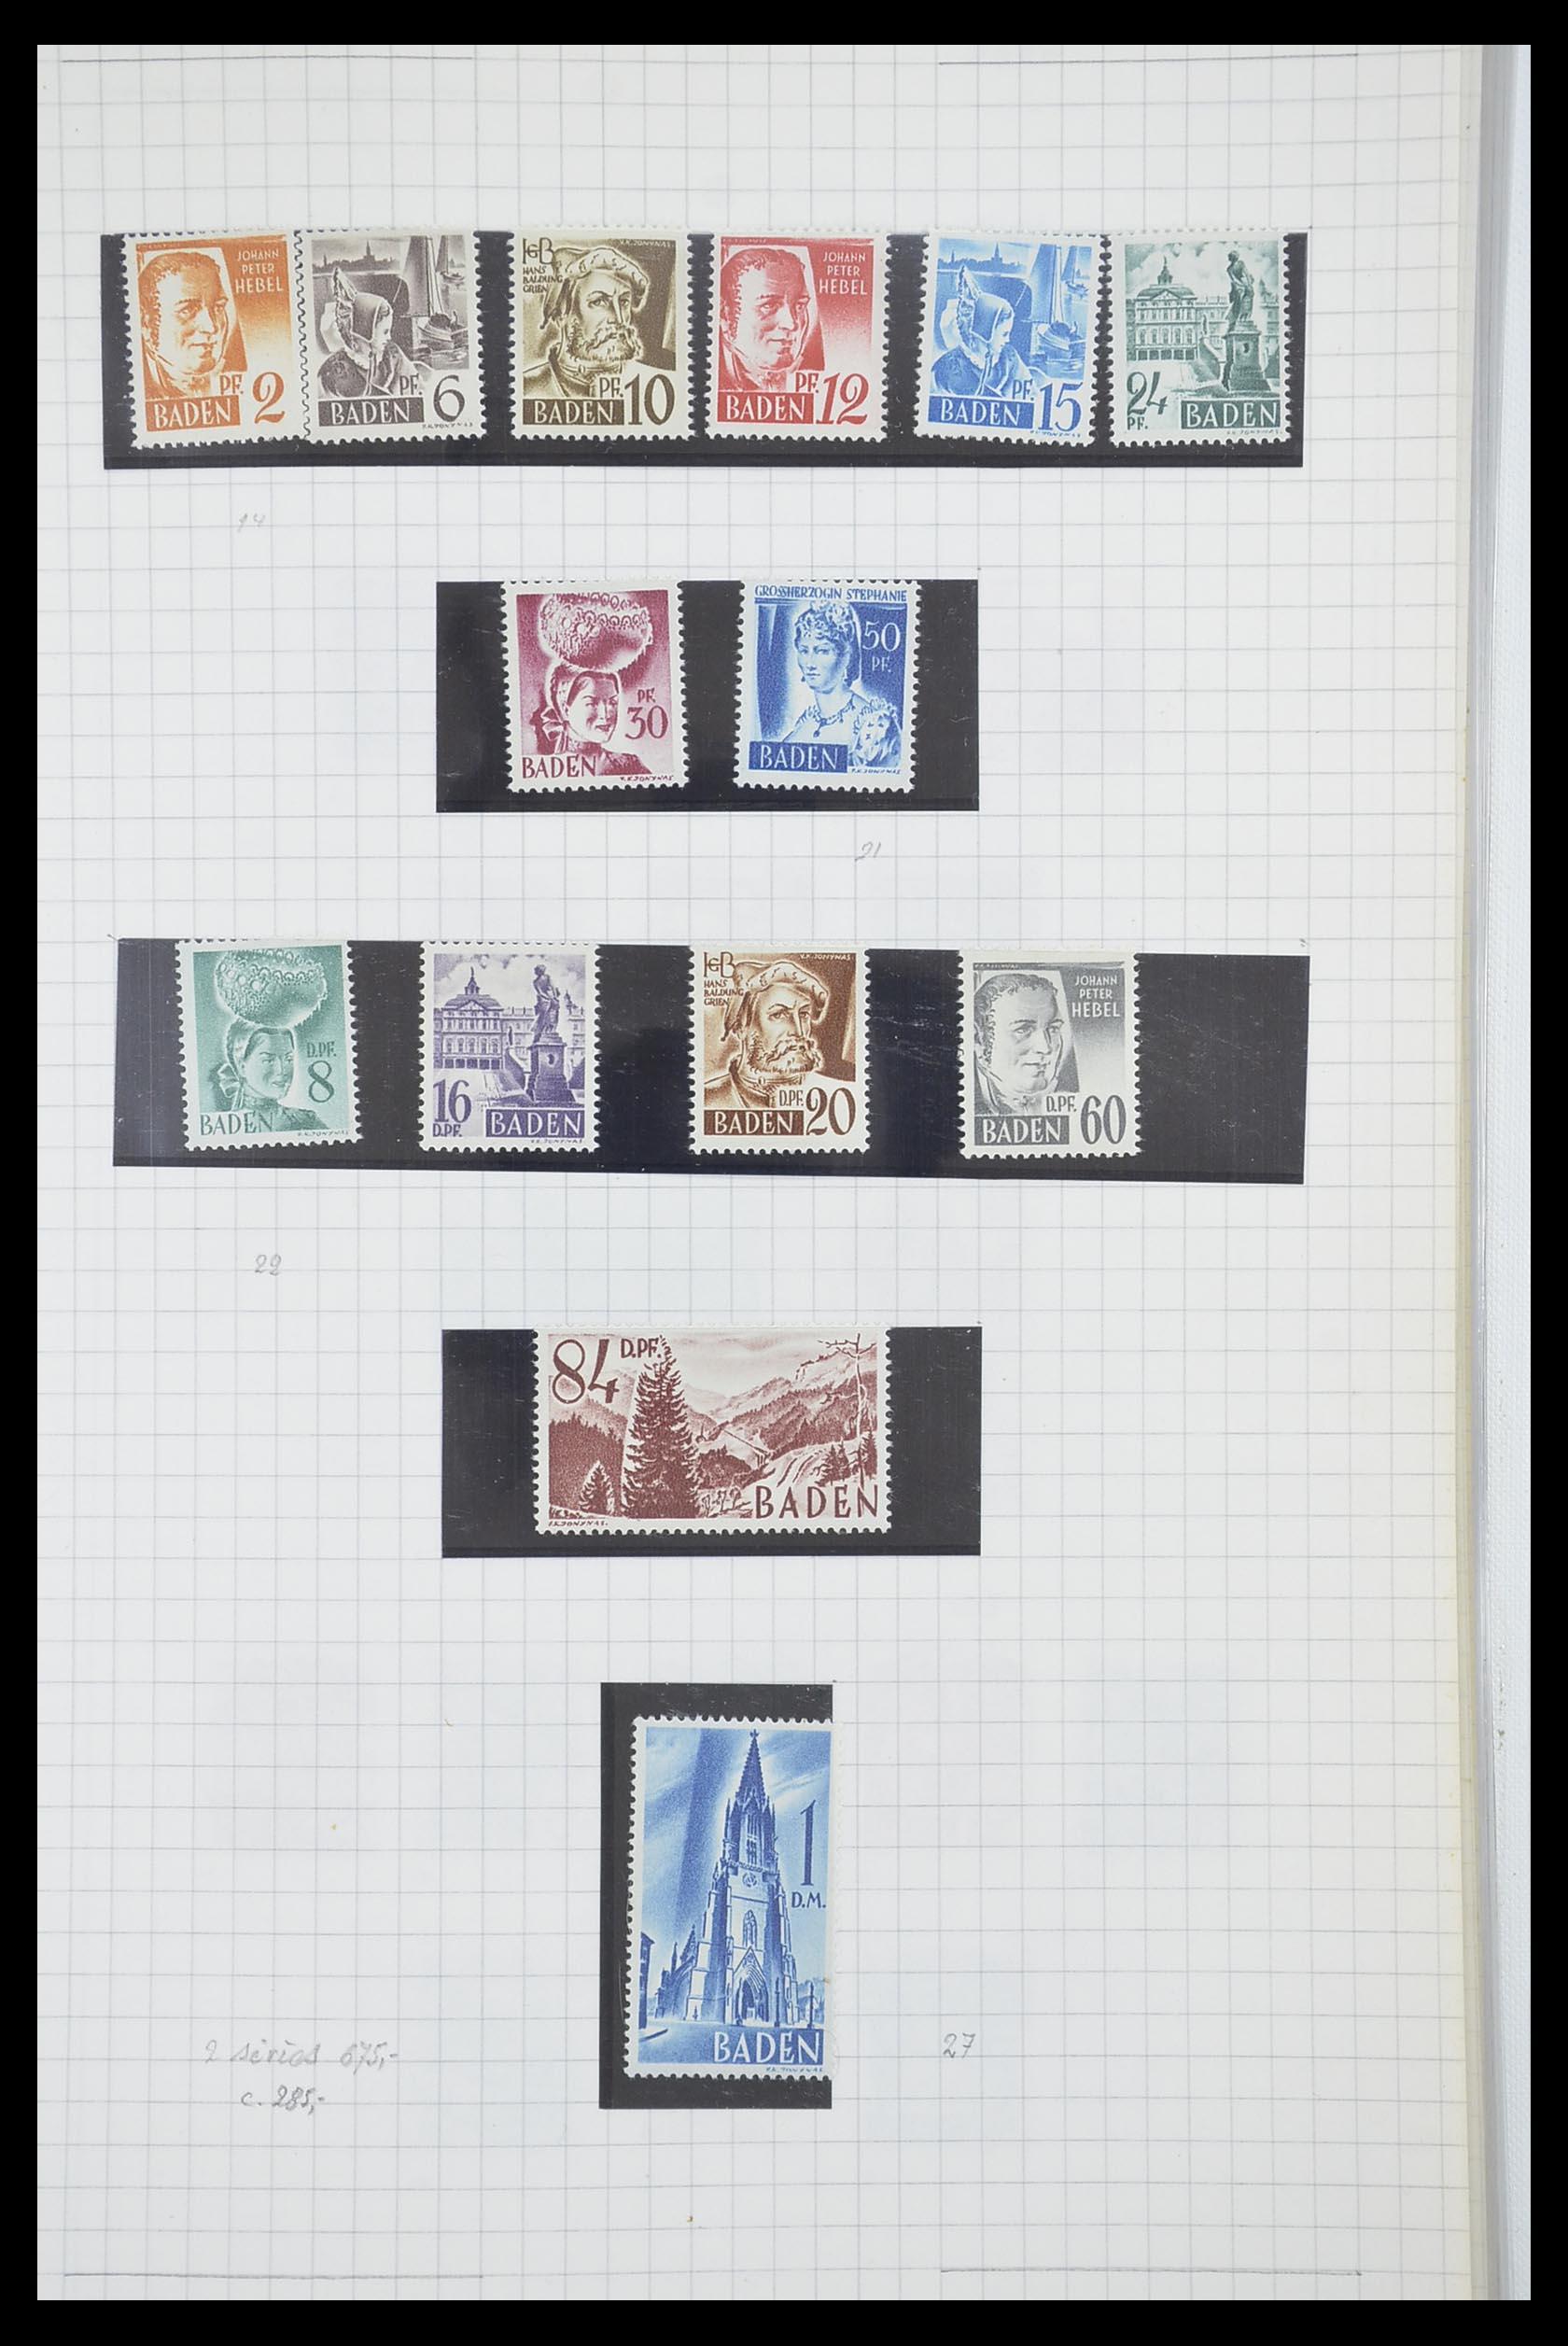 33864 006 - Postzegelverzameling 33864 Franse Zone 1945-1949.